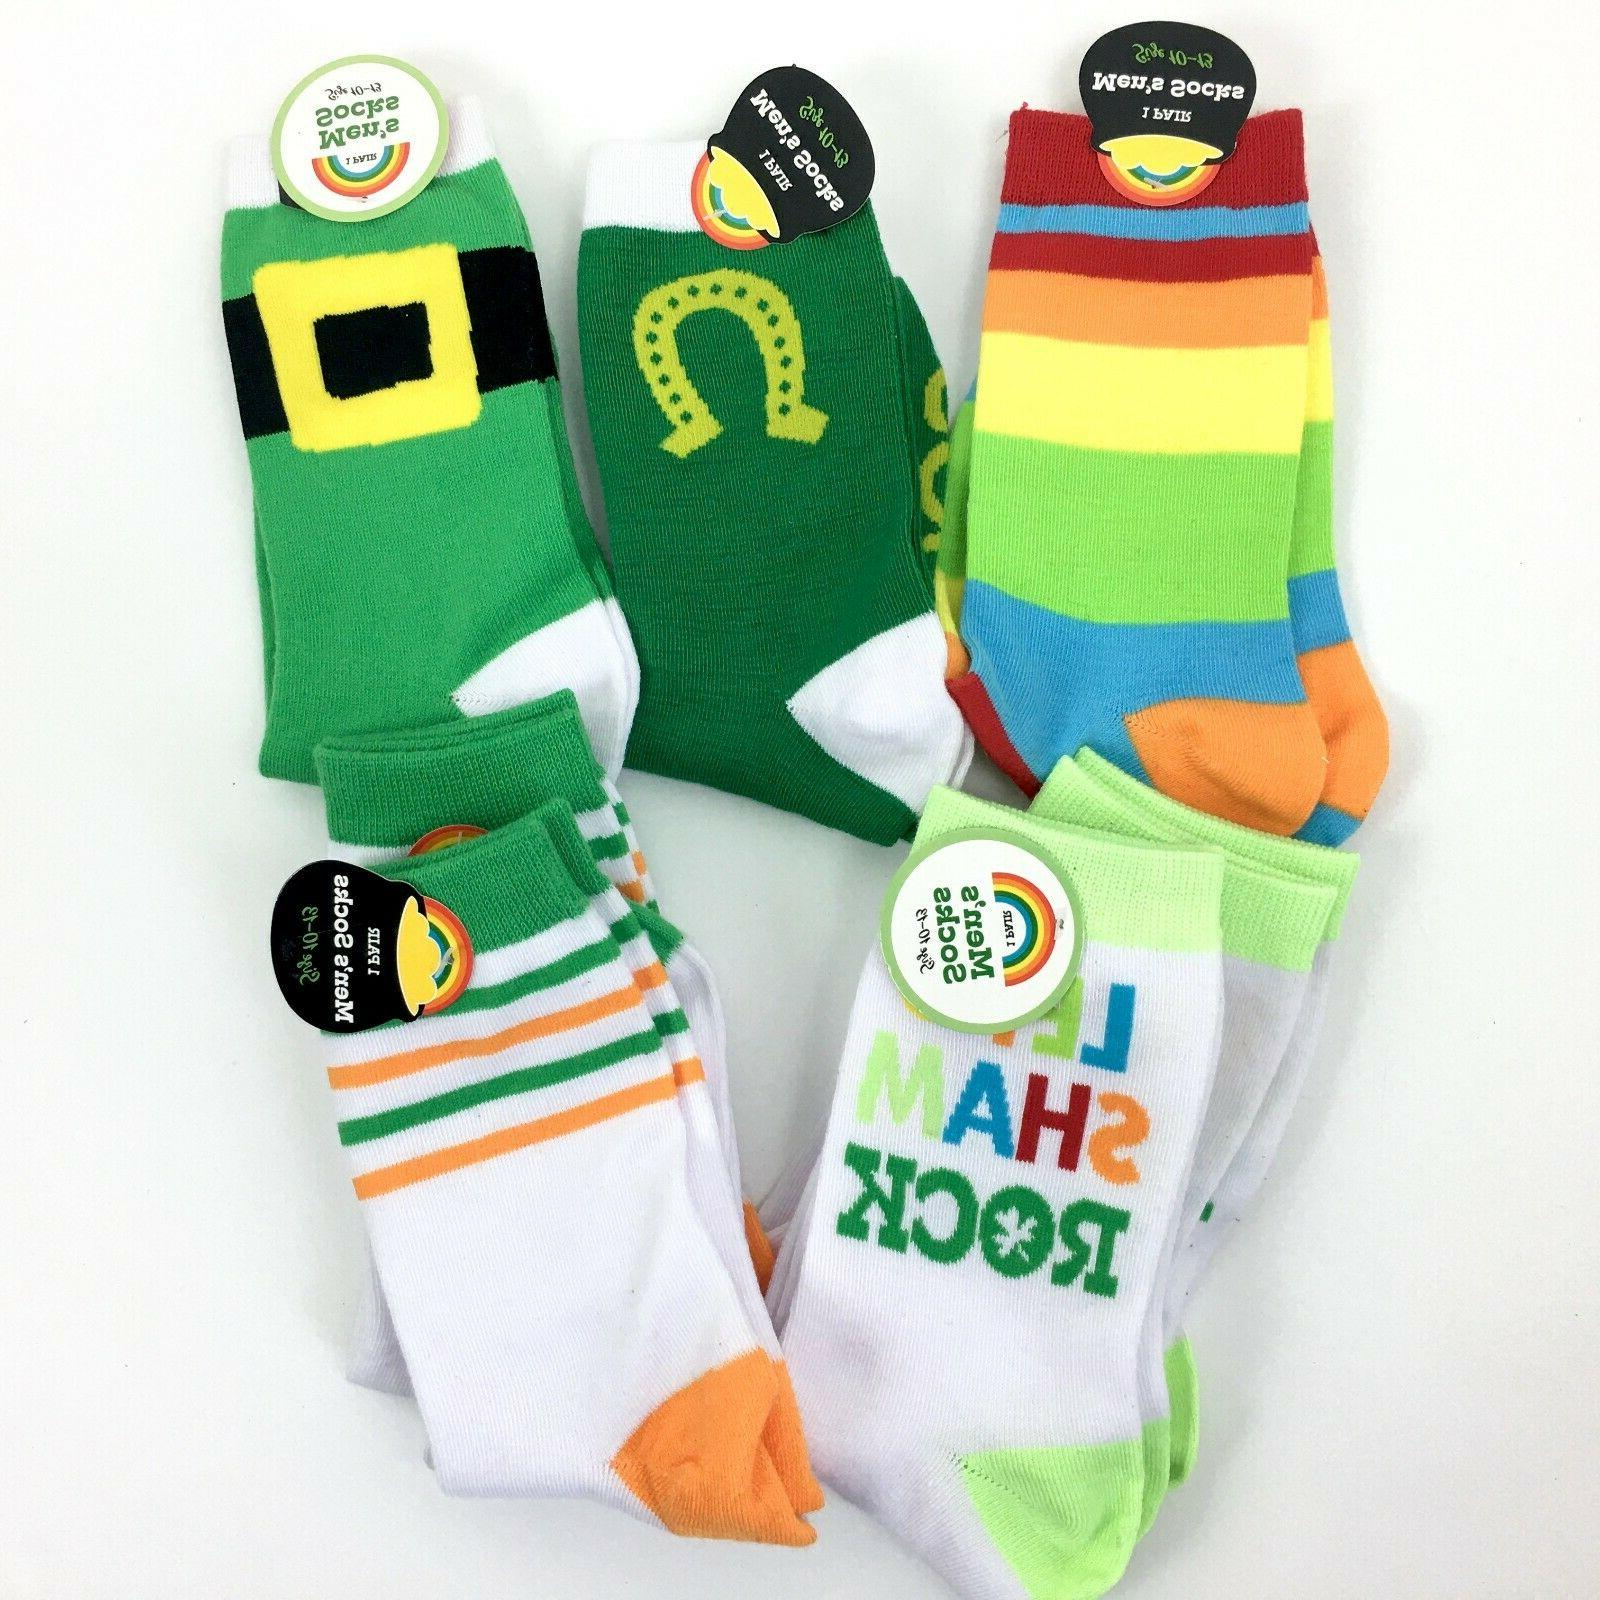 NEW Men's Assorted Novelty Crew Socks 7 Pair Rainbow Lucky S